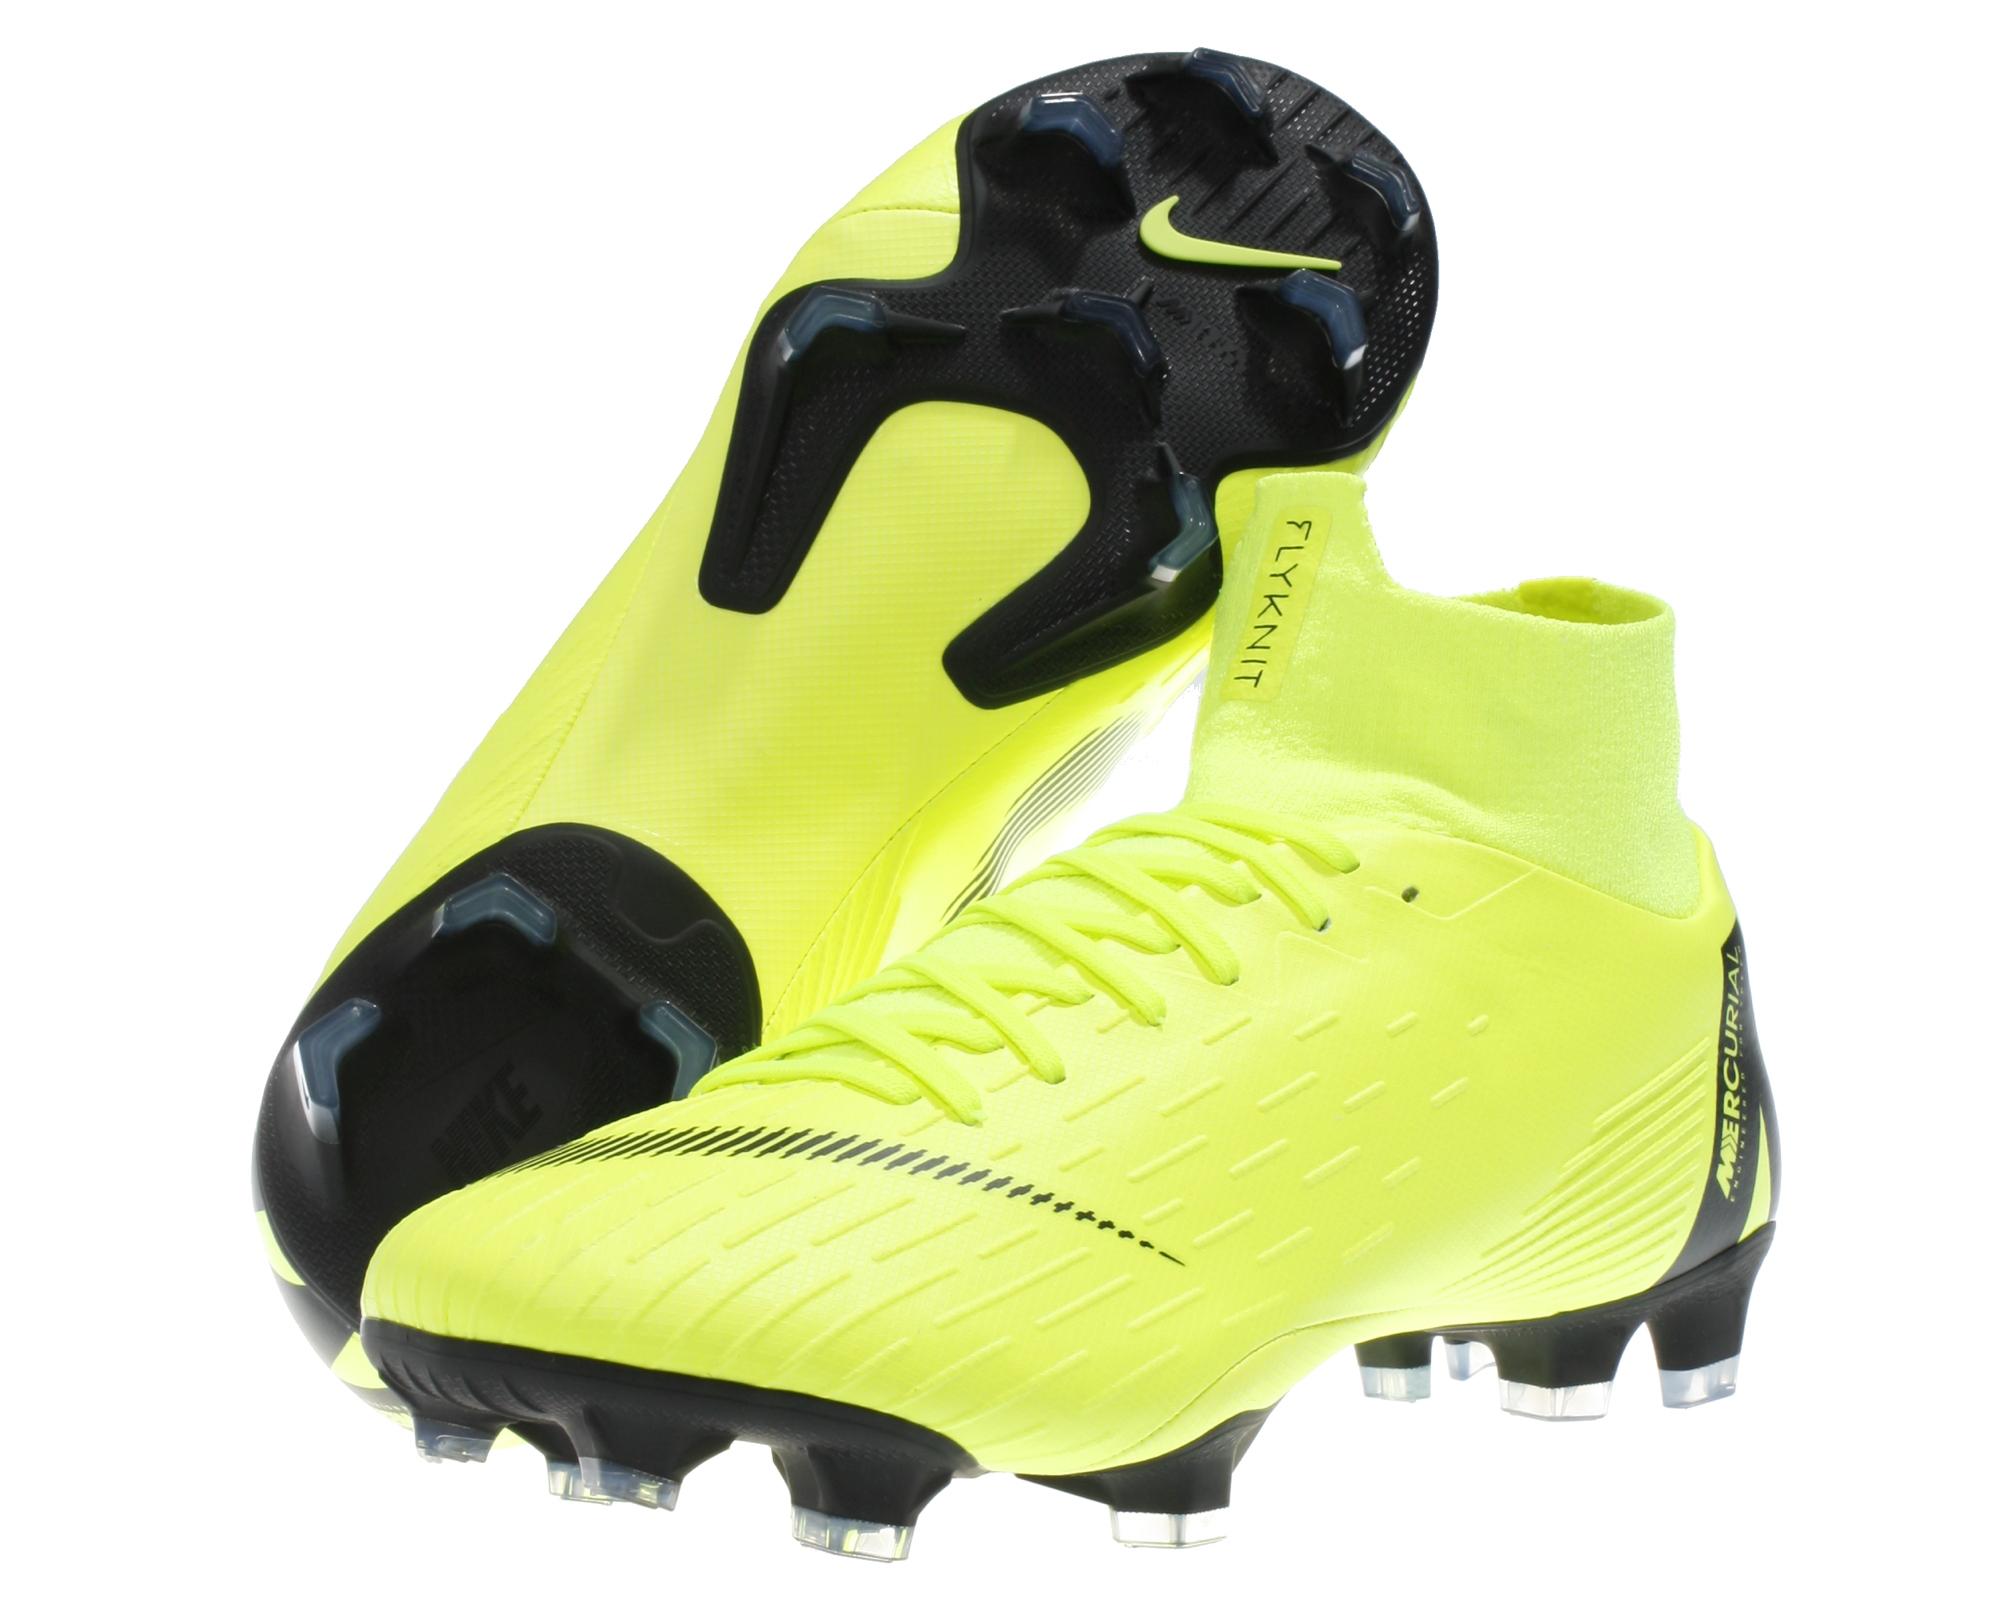 c5a56bab935 Nike Herren Fußball-Schuhe Mercurial Superfly VI PRO FG Rasen gelb ...